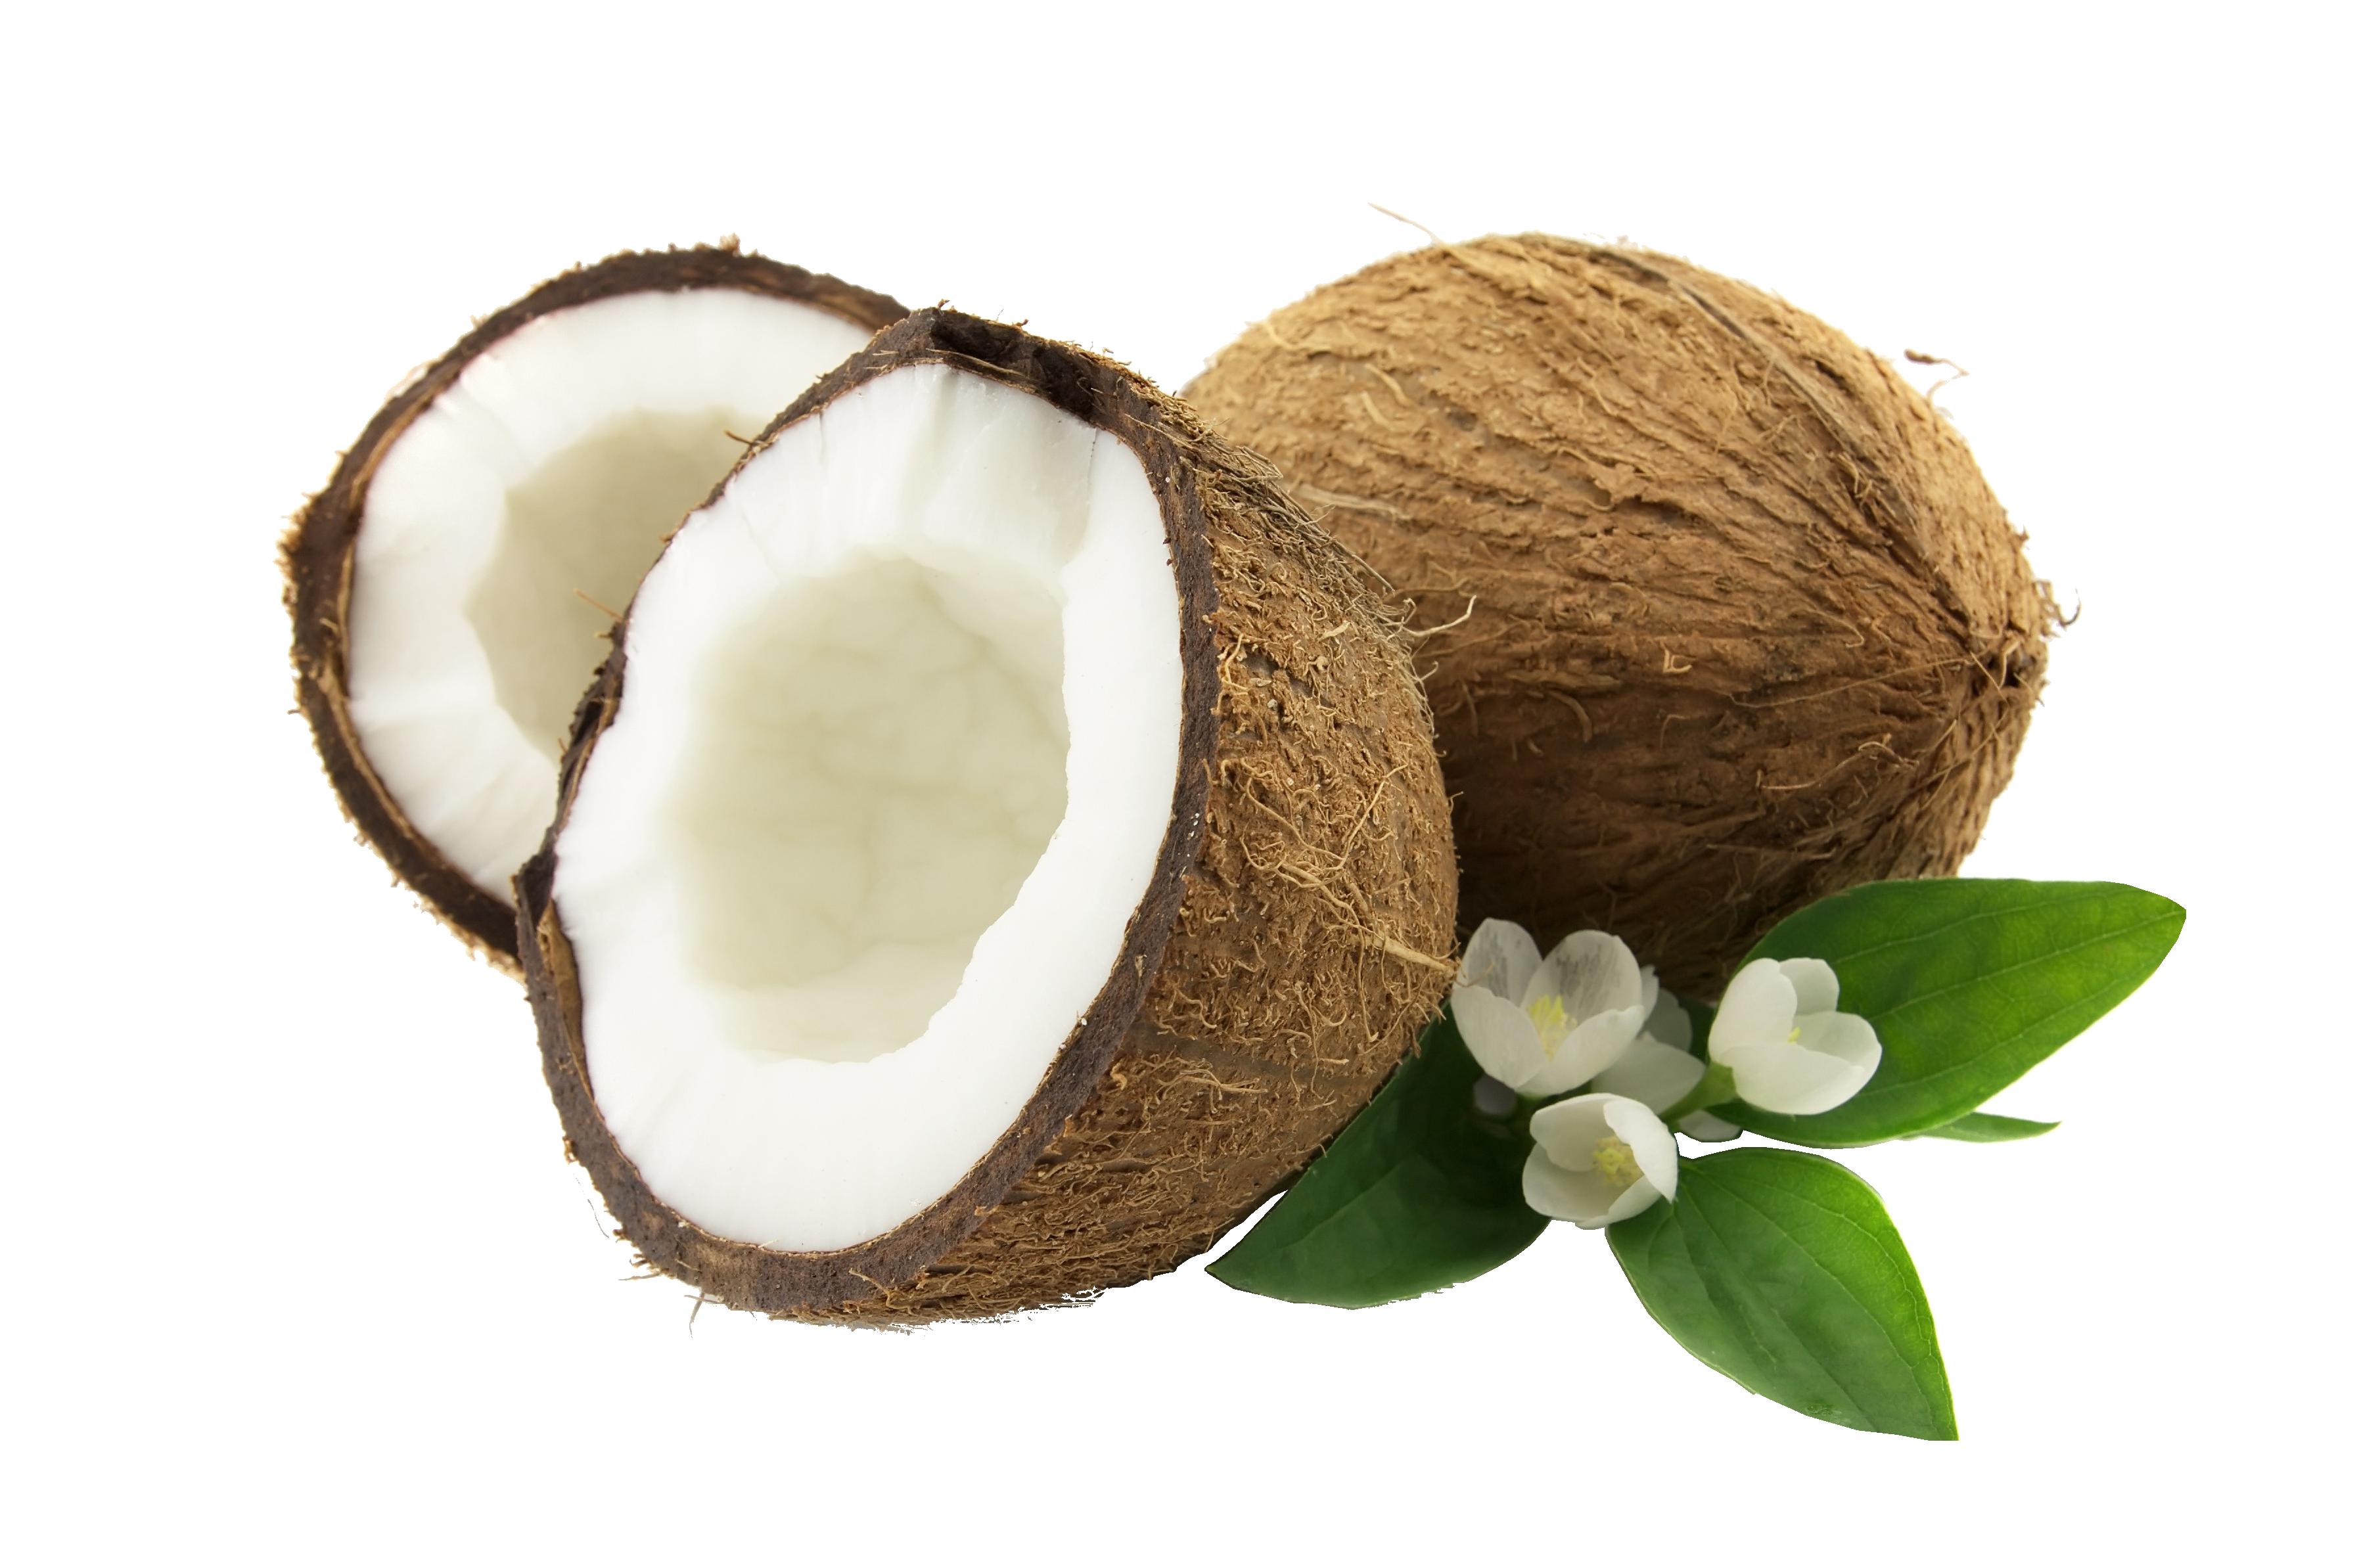 kokos-png